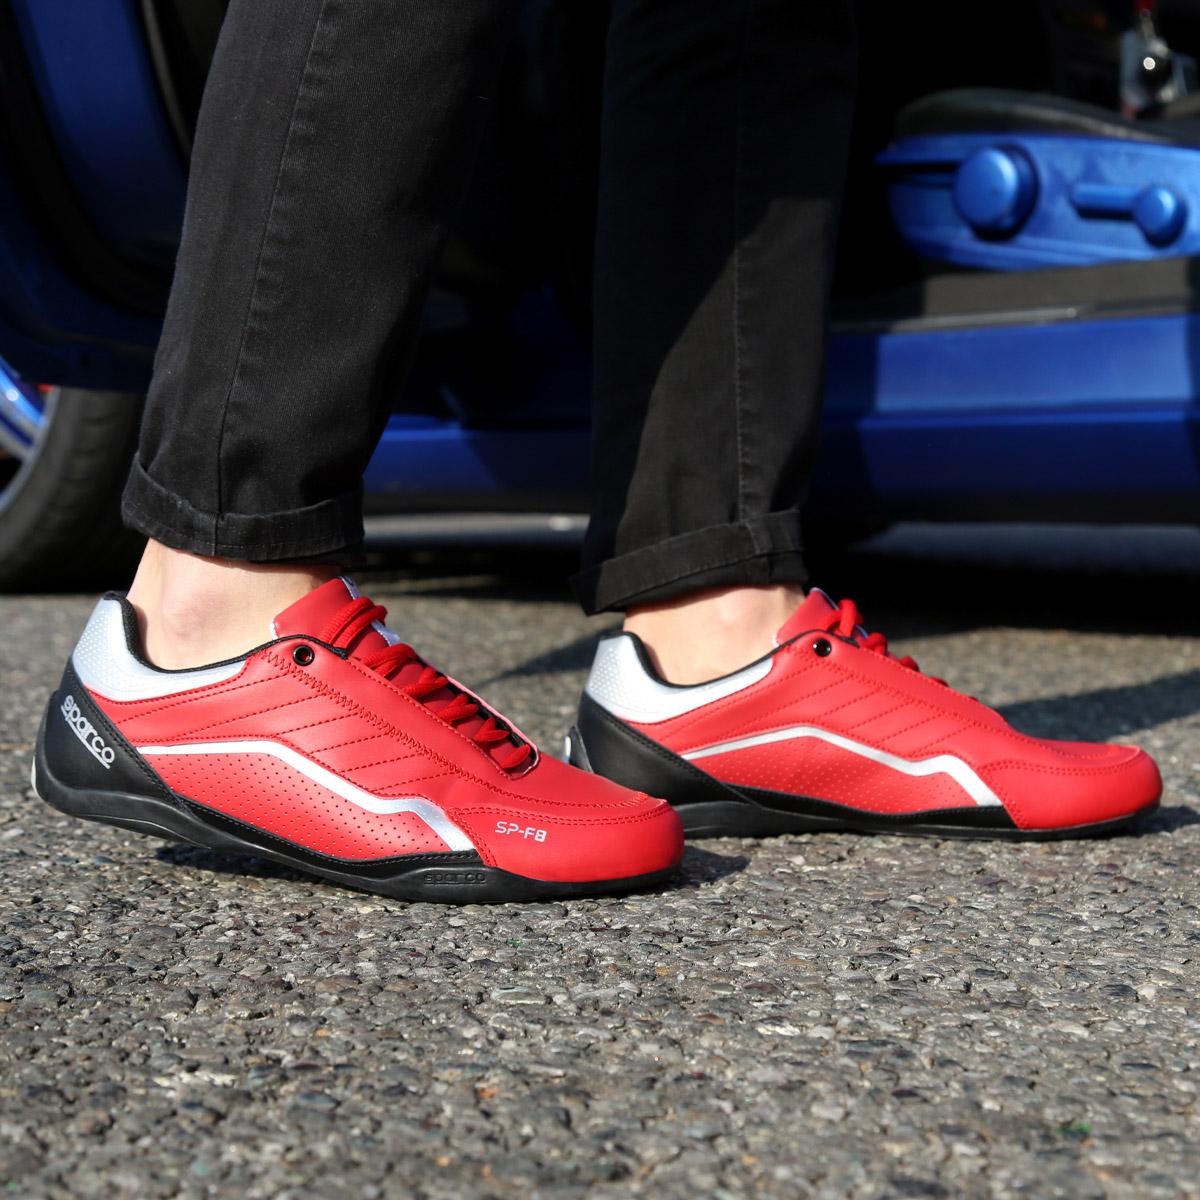 Pantofi sport Sparco SP-F8 Rosu